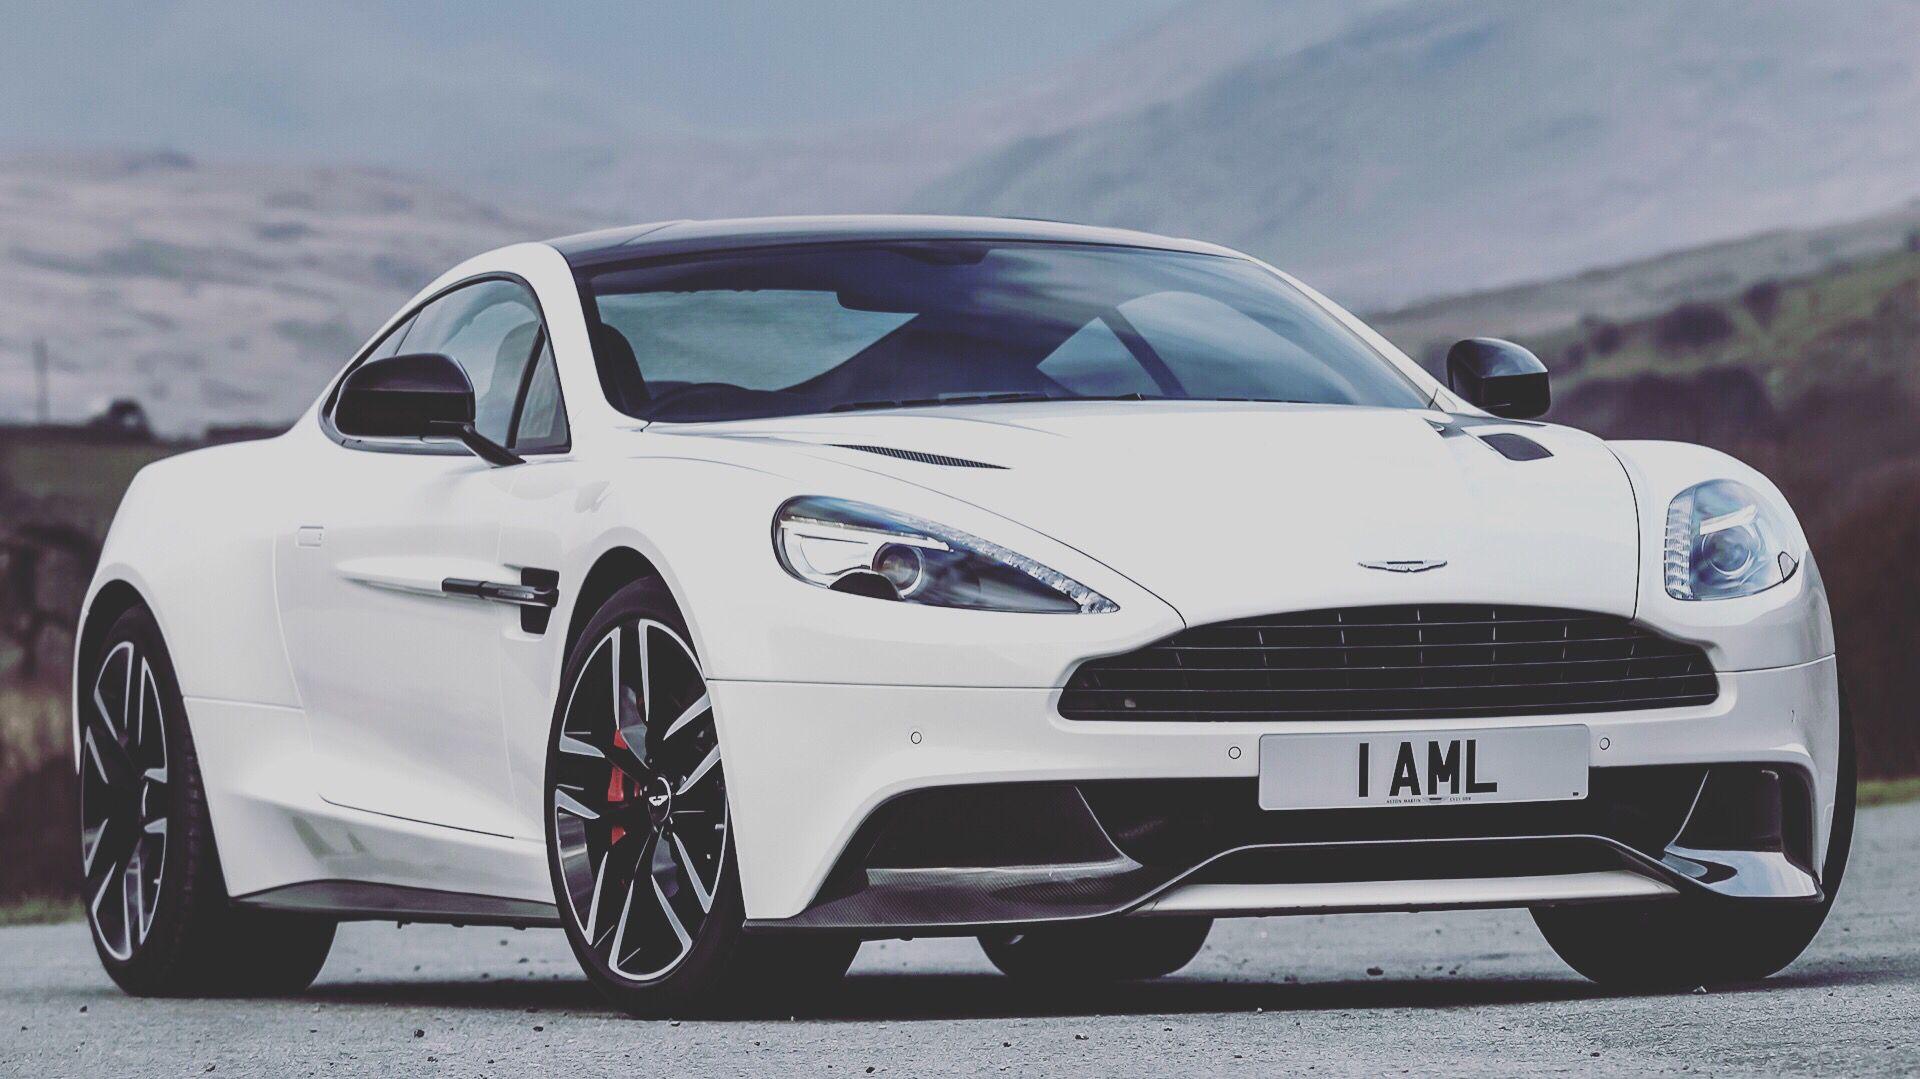 More Aston Martin love aston astonmartin happydriving bestcars